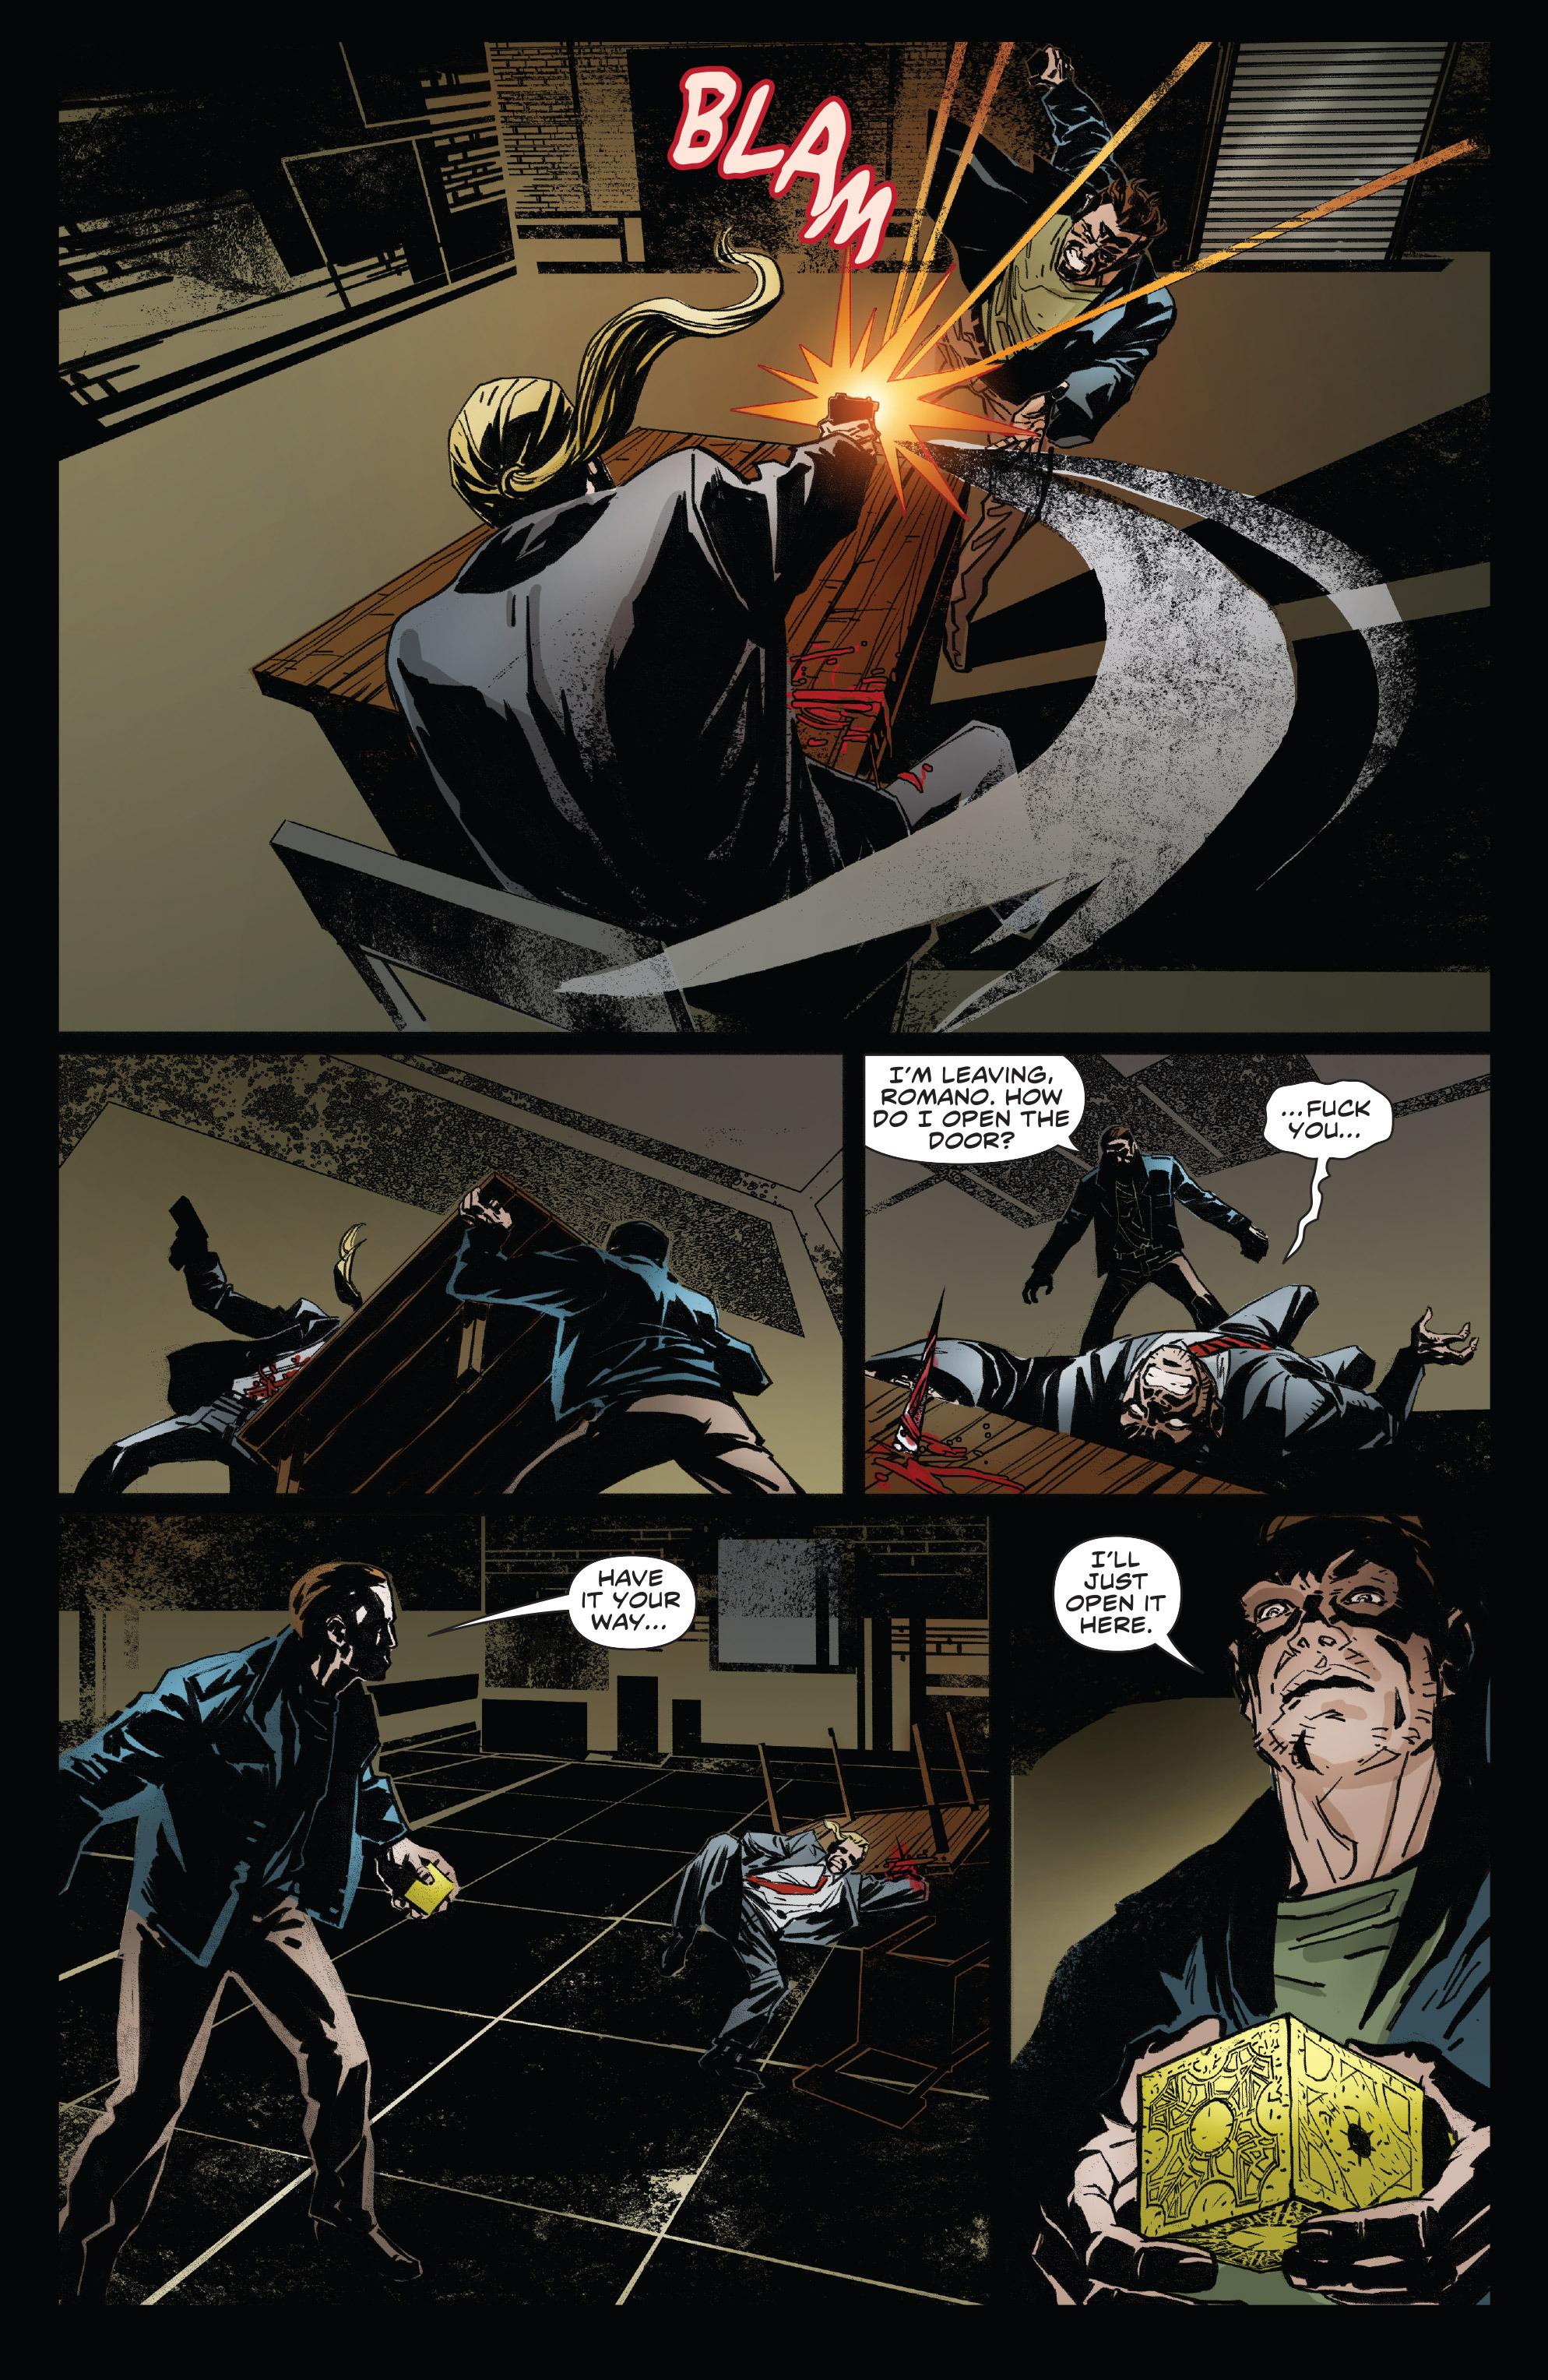 Read online Clive Barker's Hellraiser: The Dark Watch comic -  Issue # TPB 3 - 20